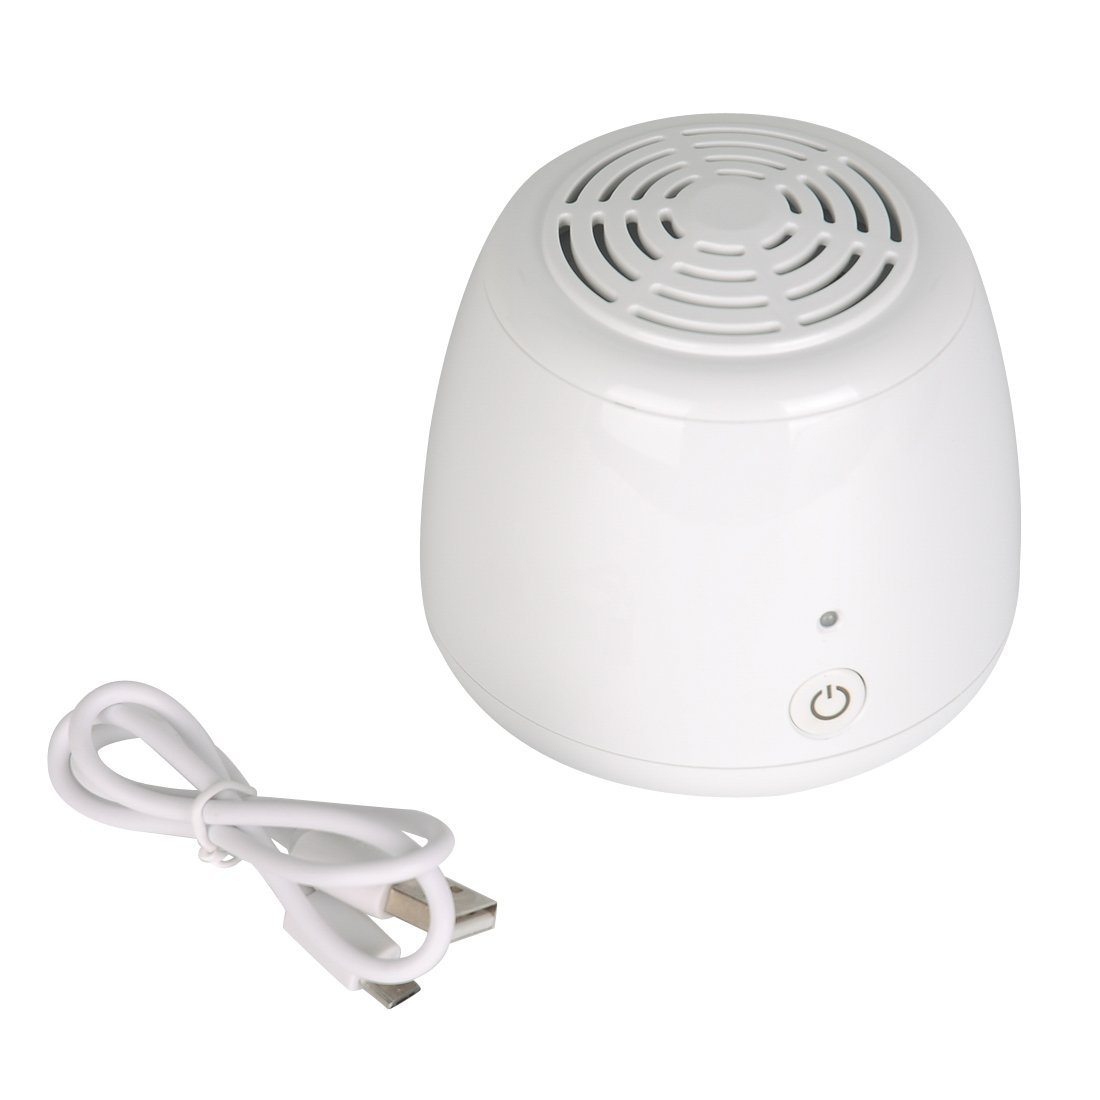 Mini purificador de aire, ZITFRI ionizador ozonizador de aire casero generador de ozono elimina olores bacterias humos impurezas para refrigerador armario ...